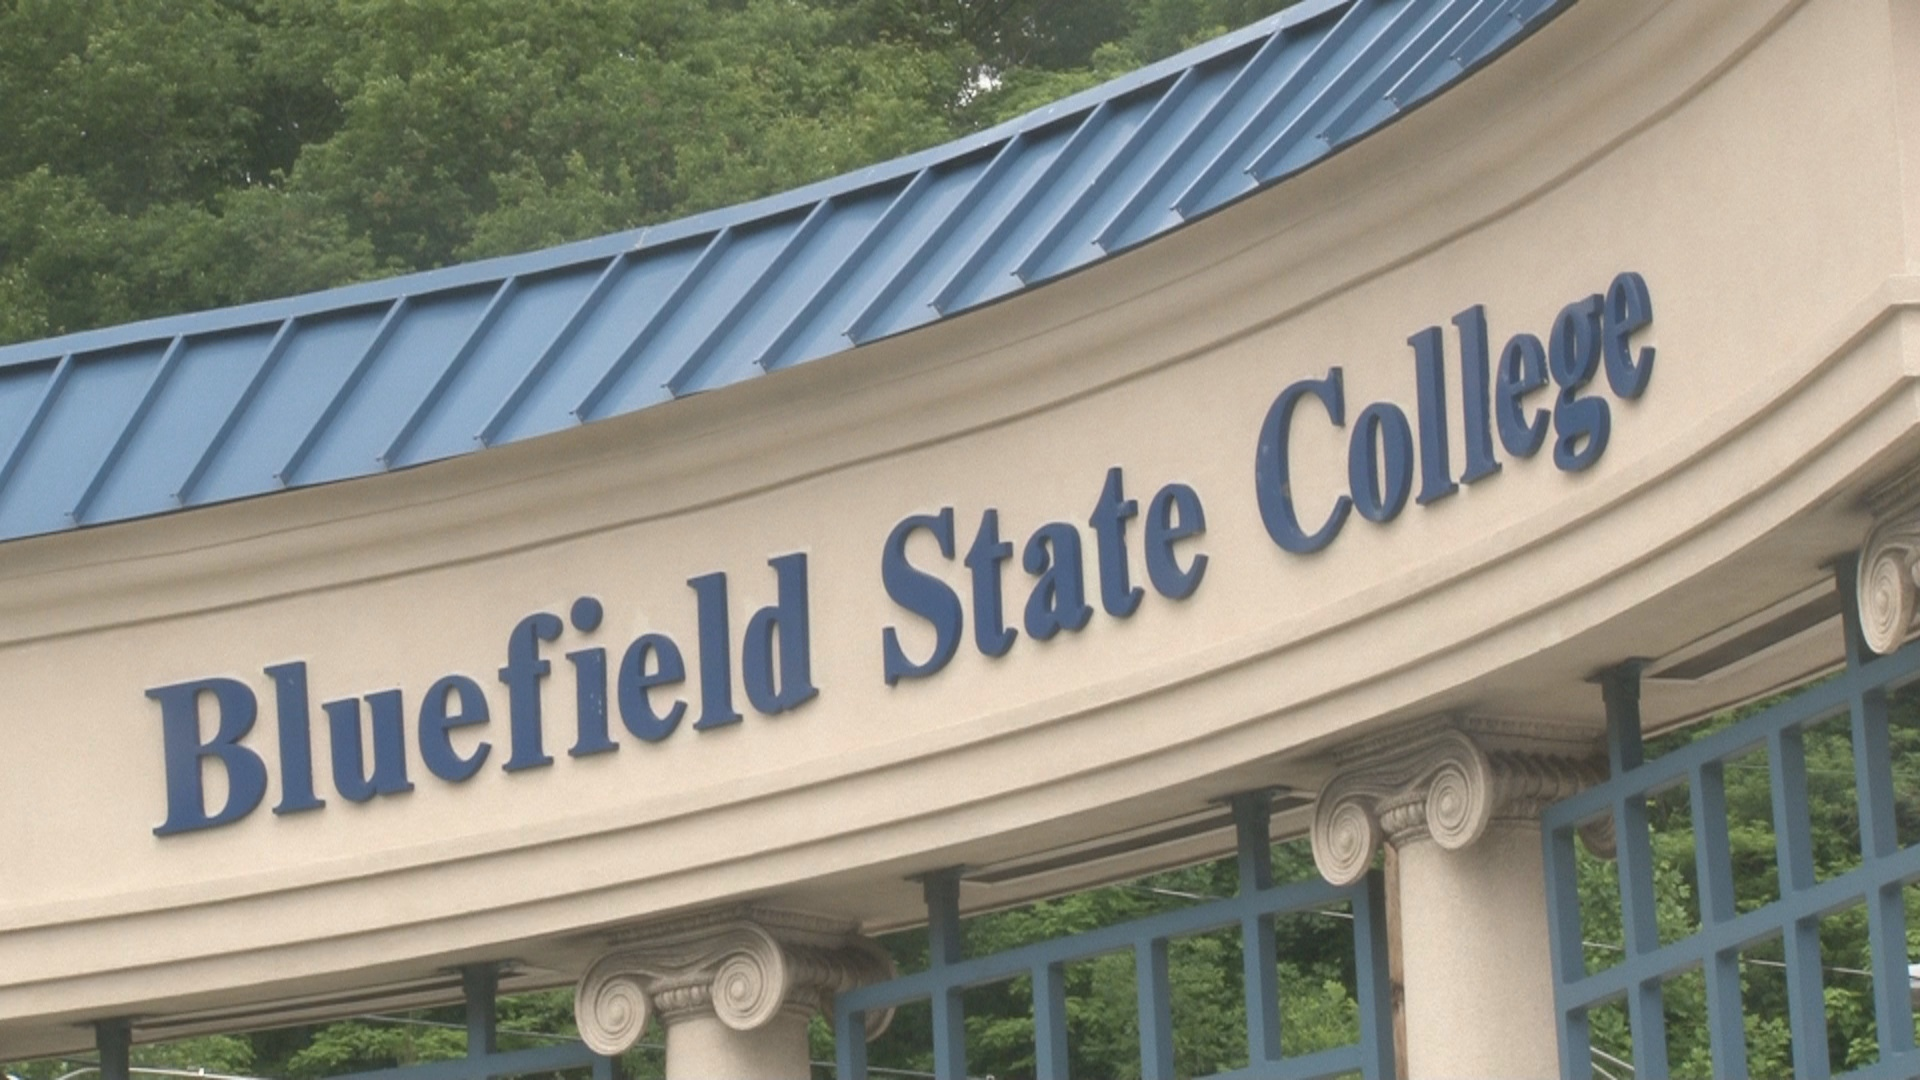 Bluefield State College.jpg